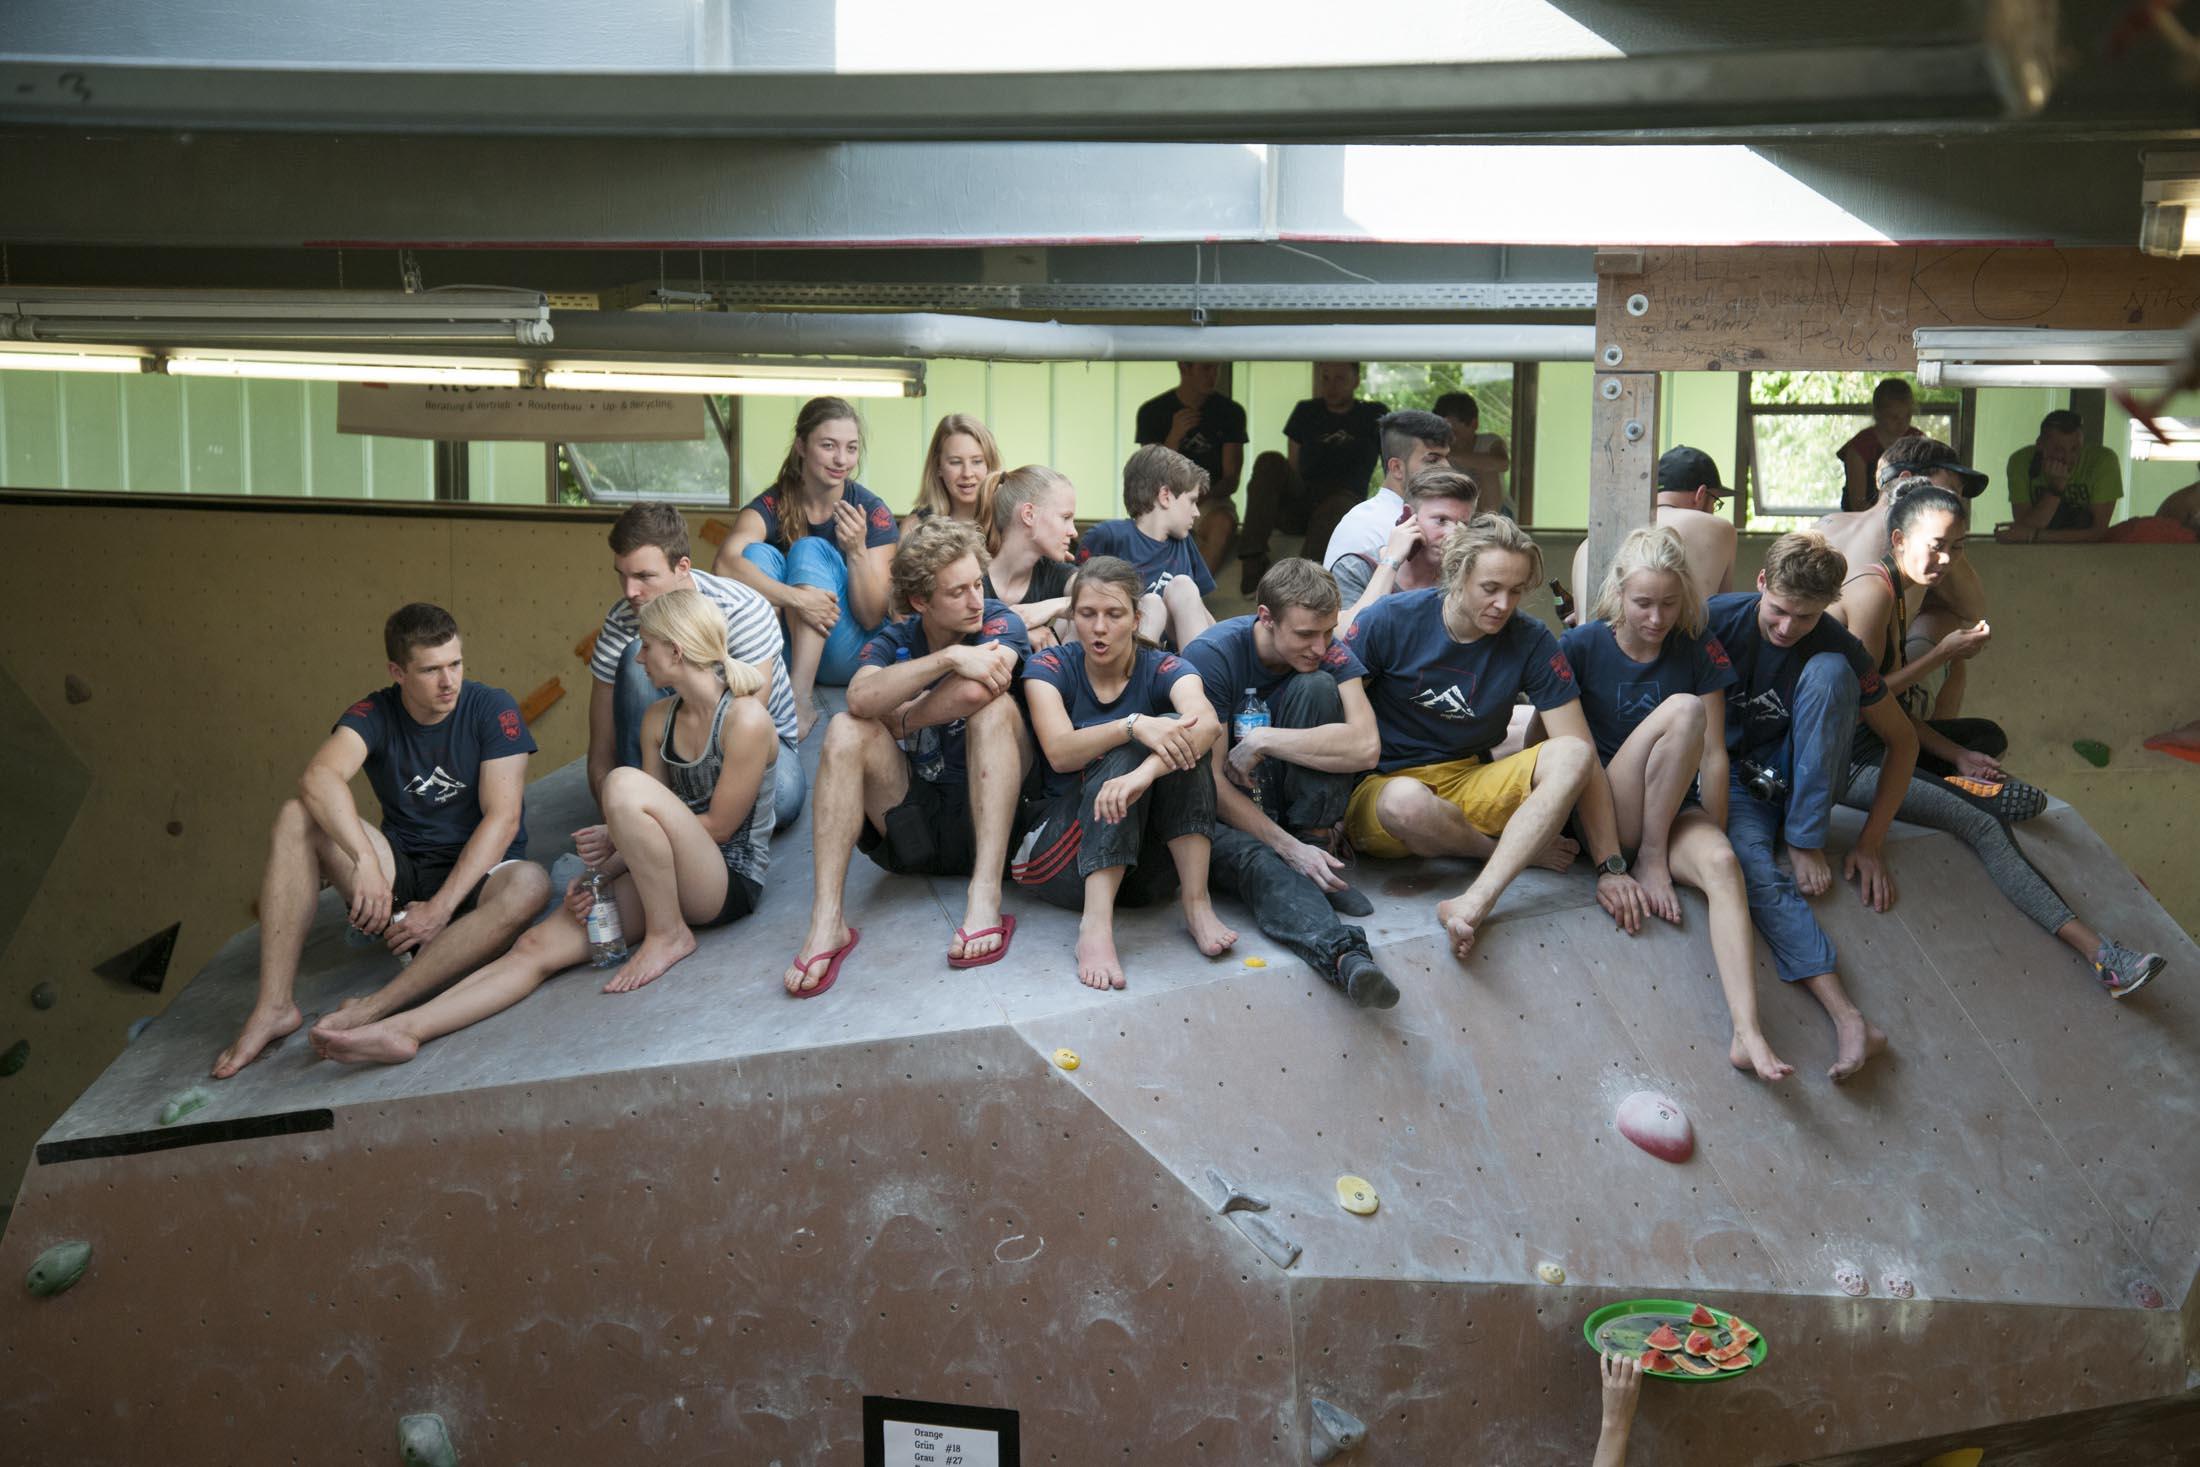 Quali, internationaler bouldercup Frankenjura 2016, BLOCKHELDEN Erlangen, Mammut, Bergfreunde.de, Boulderwettkampf07092016436